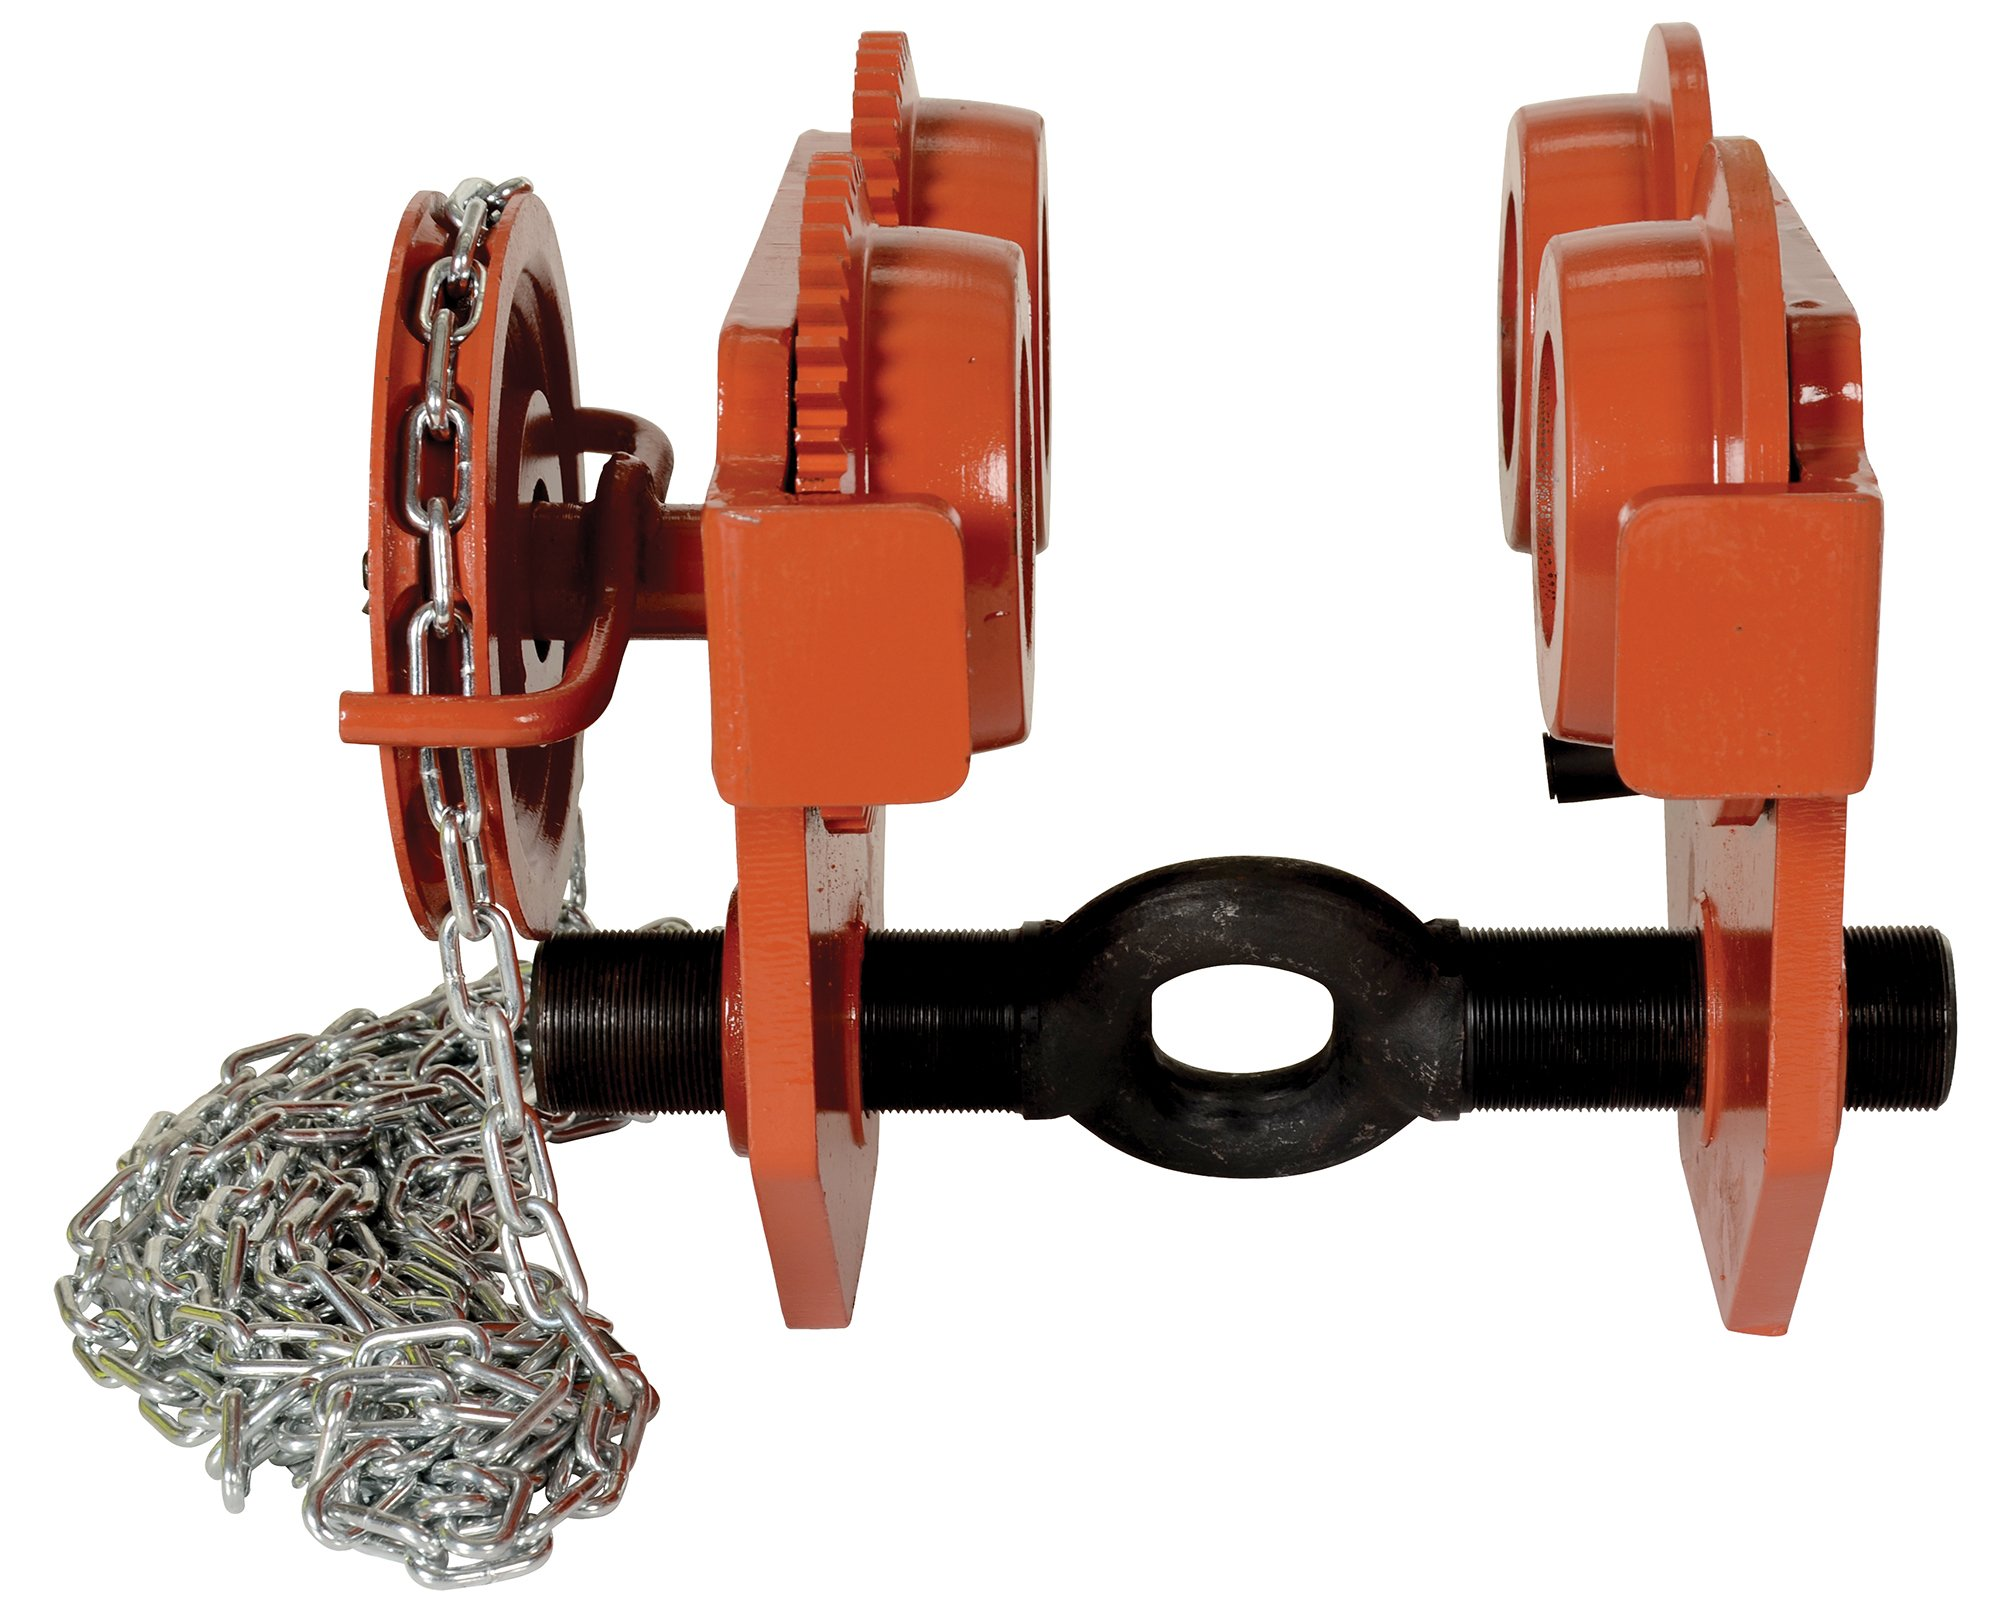 Vestil E-MT-8-C Steel Low Profile Eye Manual Chain Geared Trolley 8-5//8 Headroom Capacity 8,000-lb 3-1//2-8 I-Beam Flange